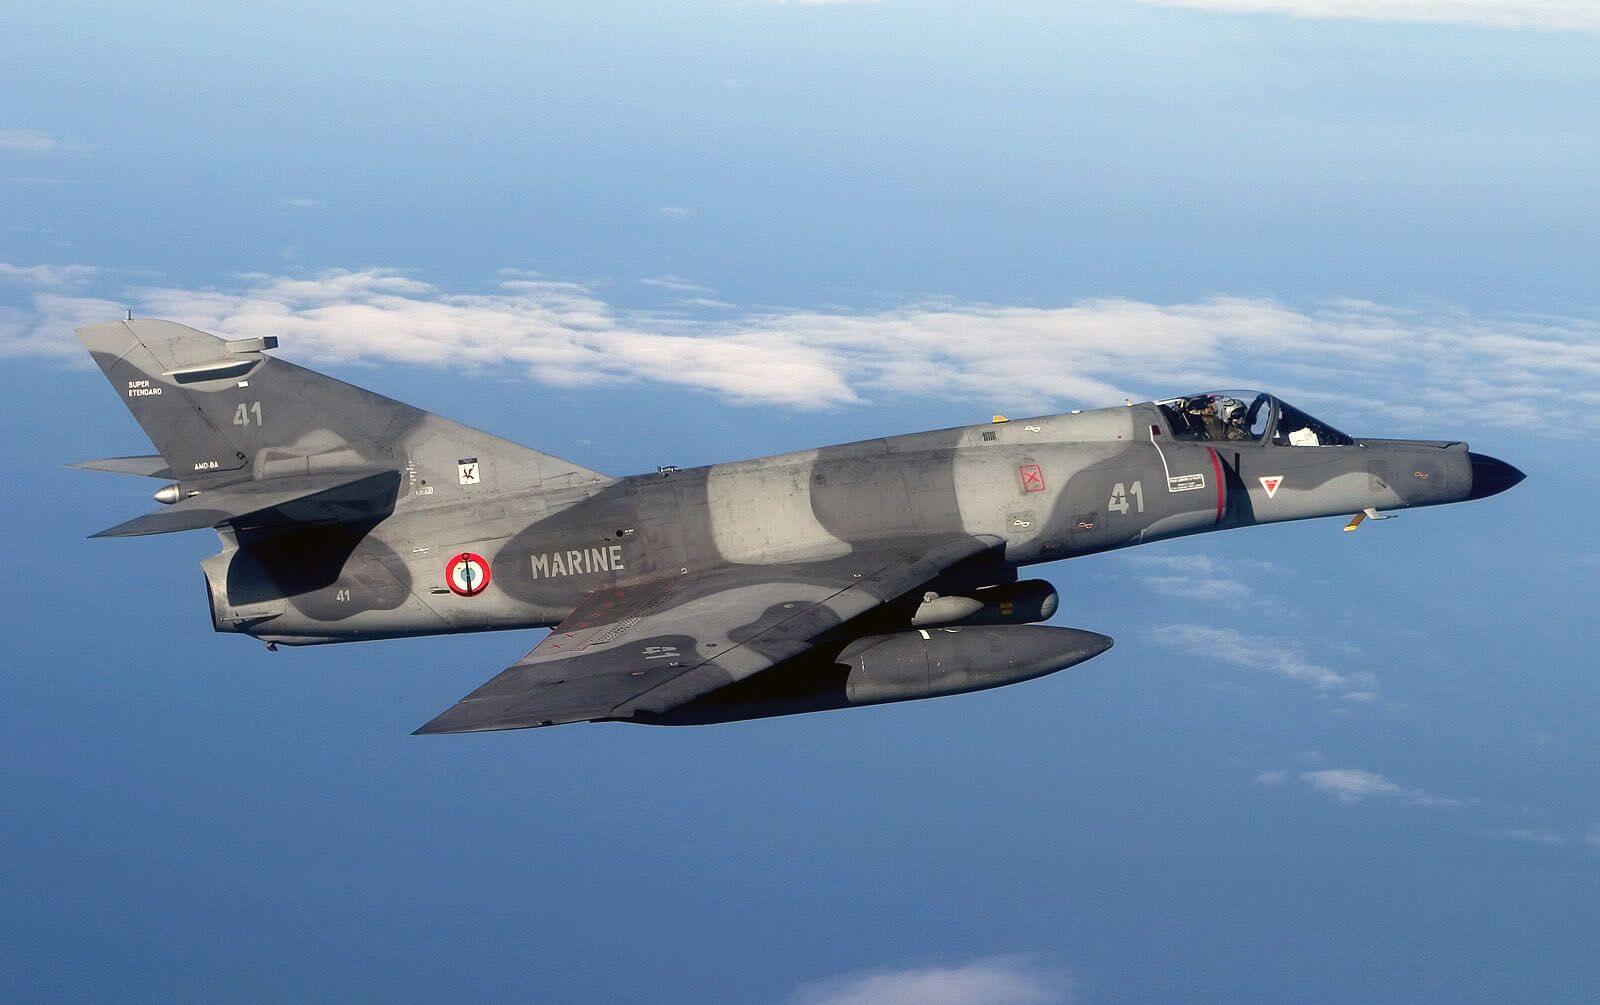 Flight Manual for the Dassault Etendard